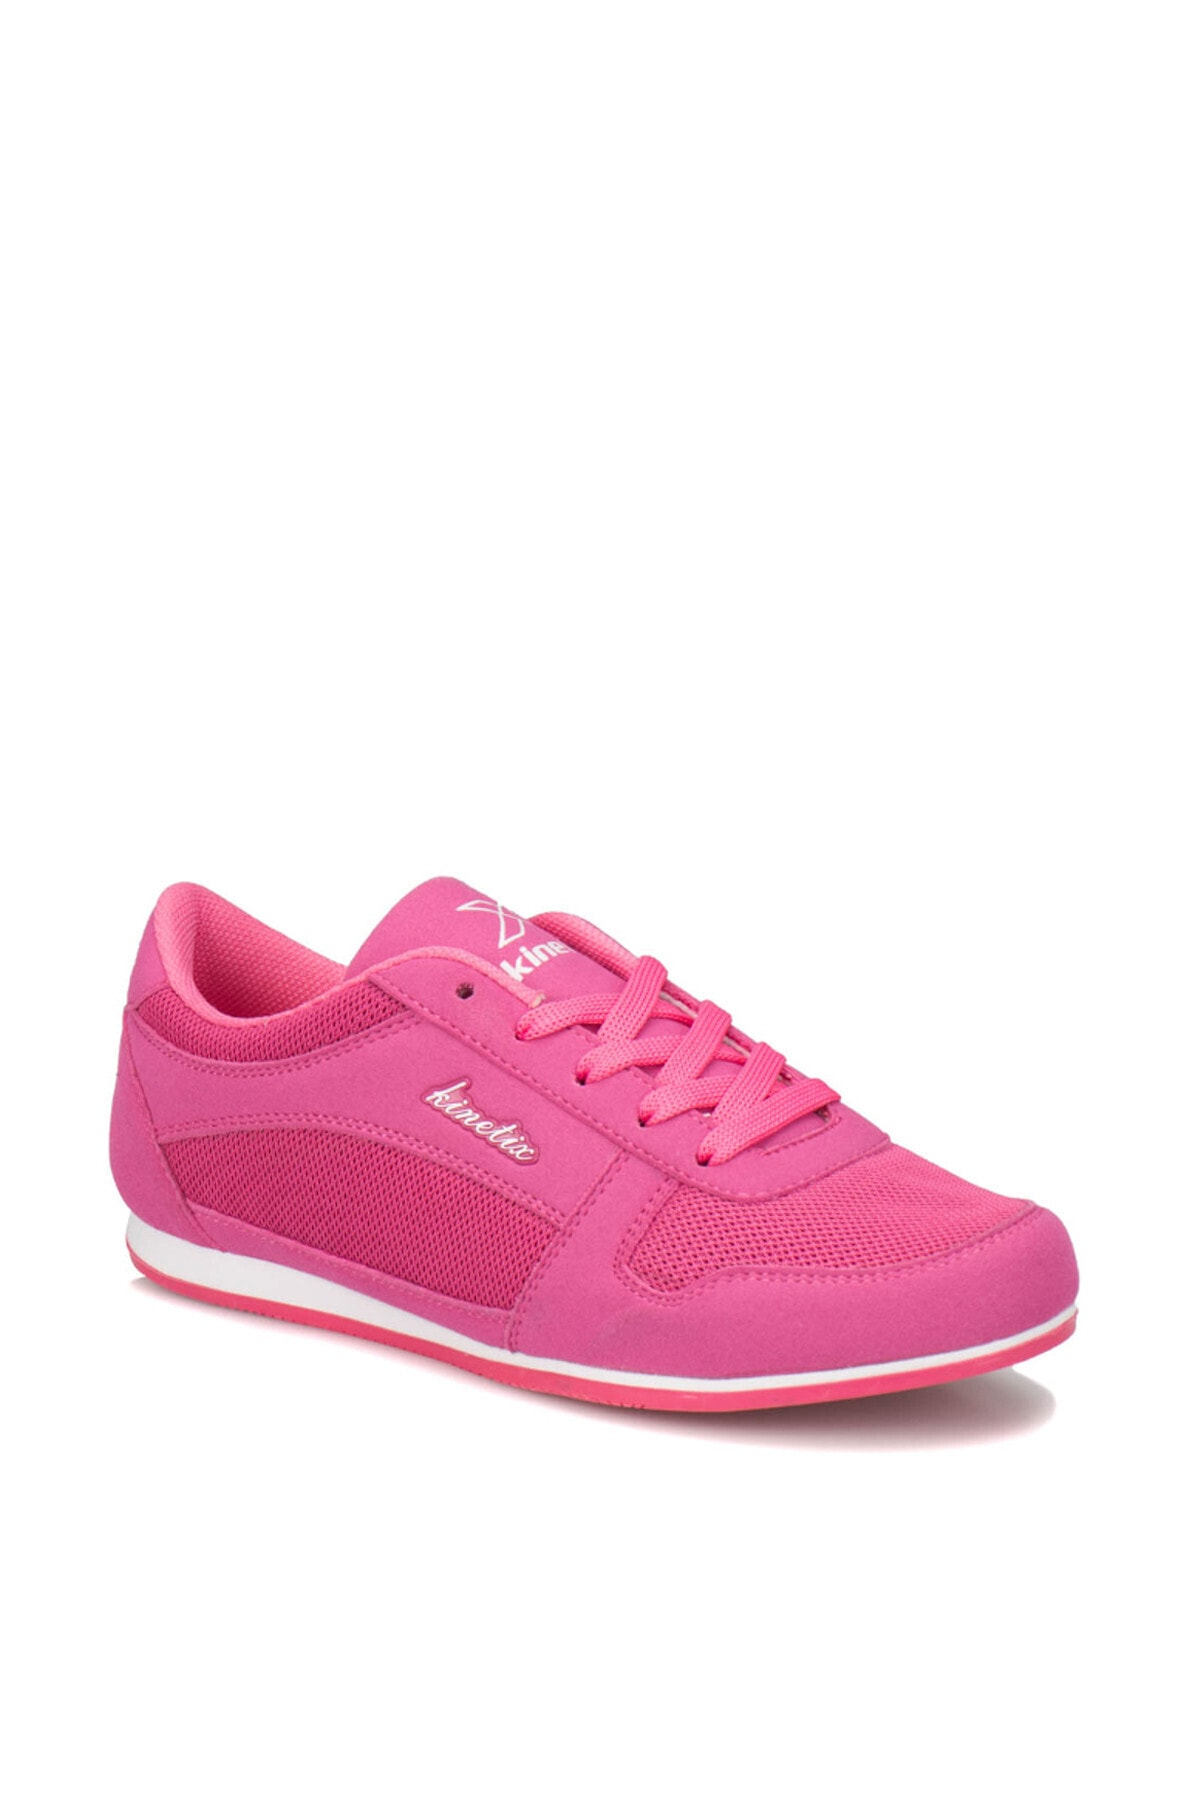 Kinetix LENY Fuşya Kadın Sneaker 100243507 1